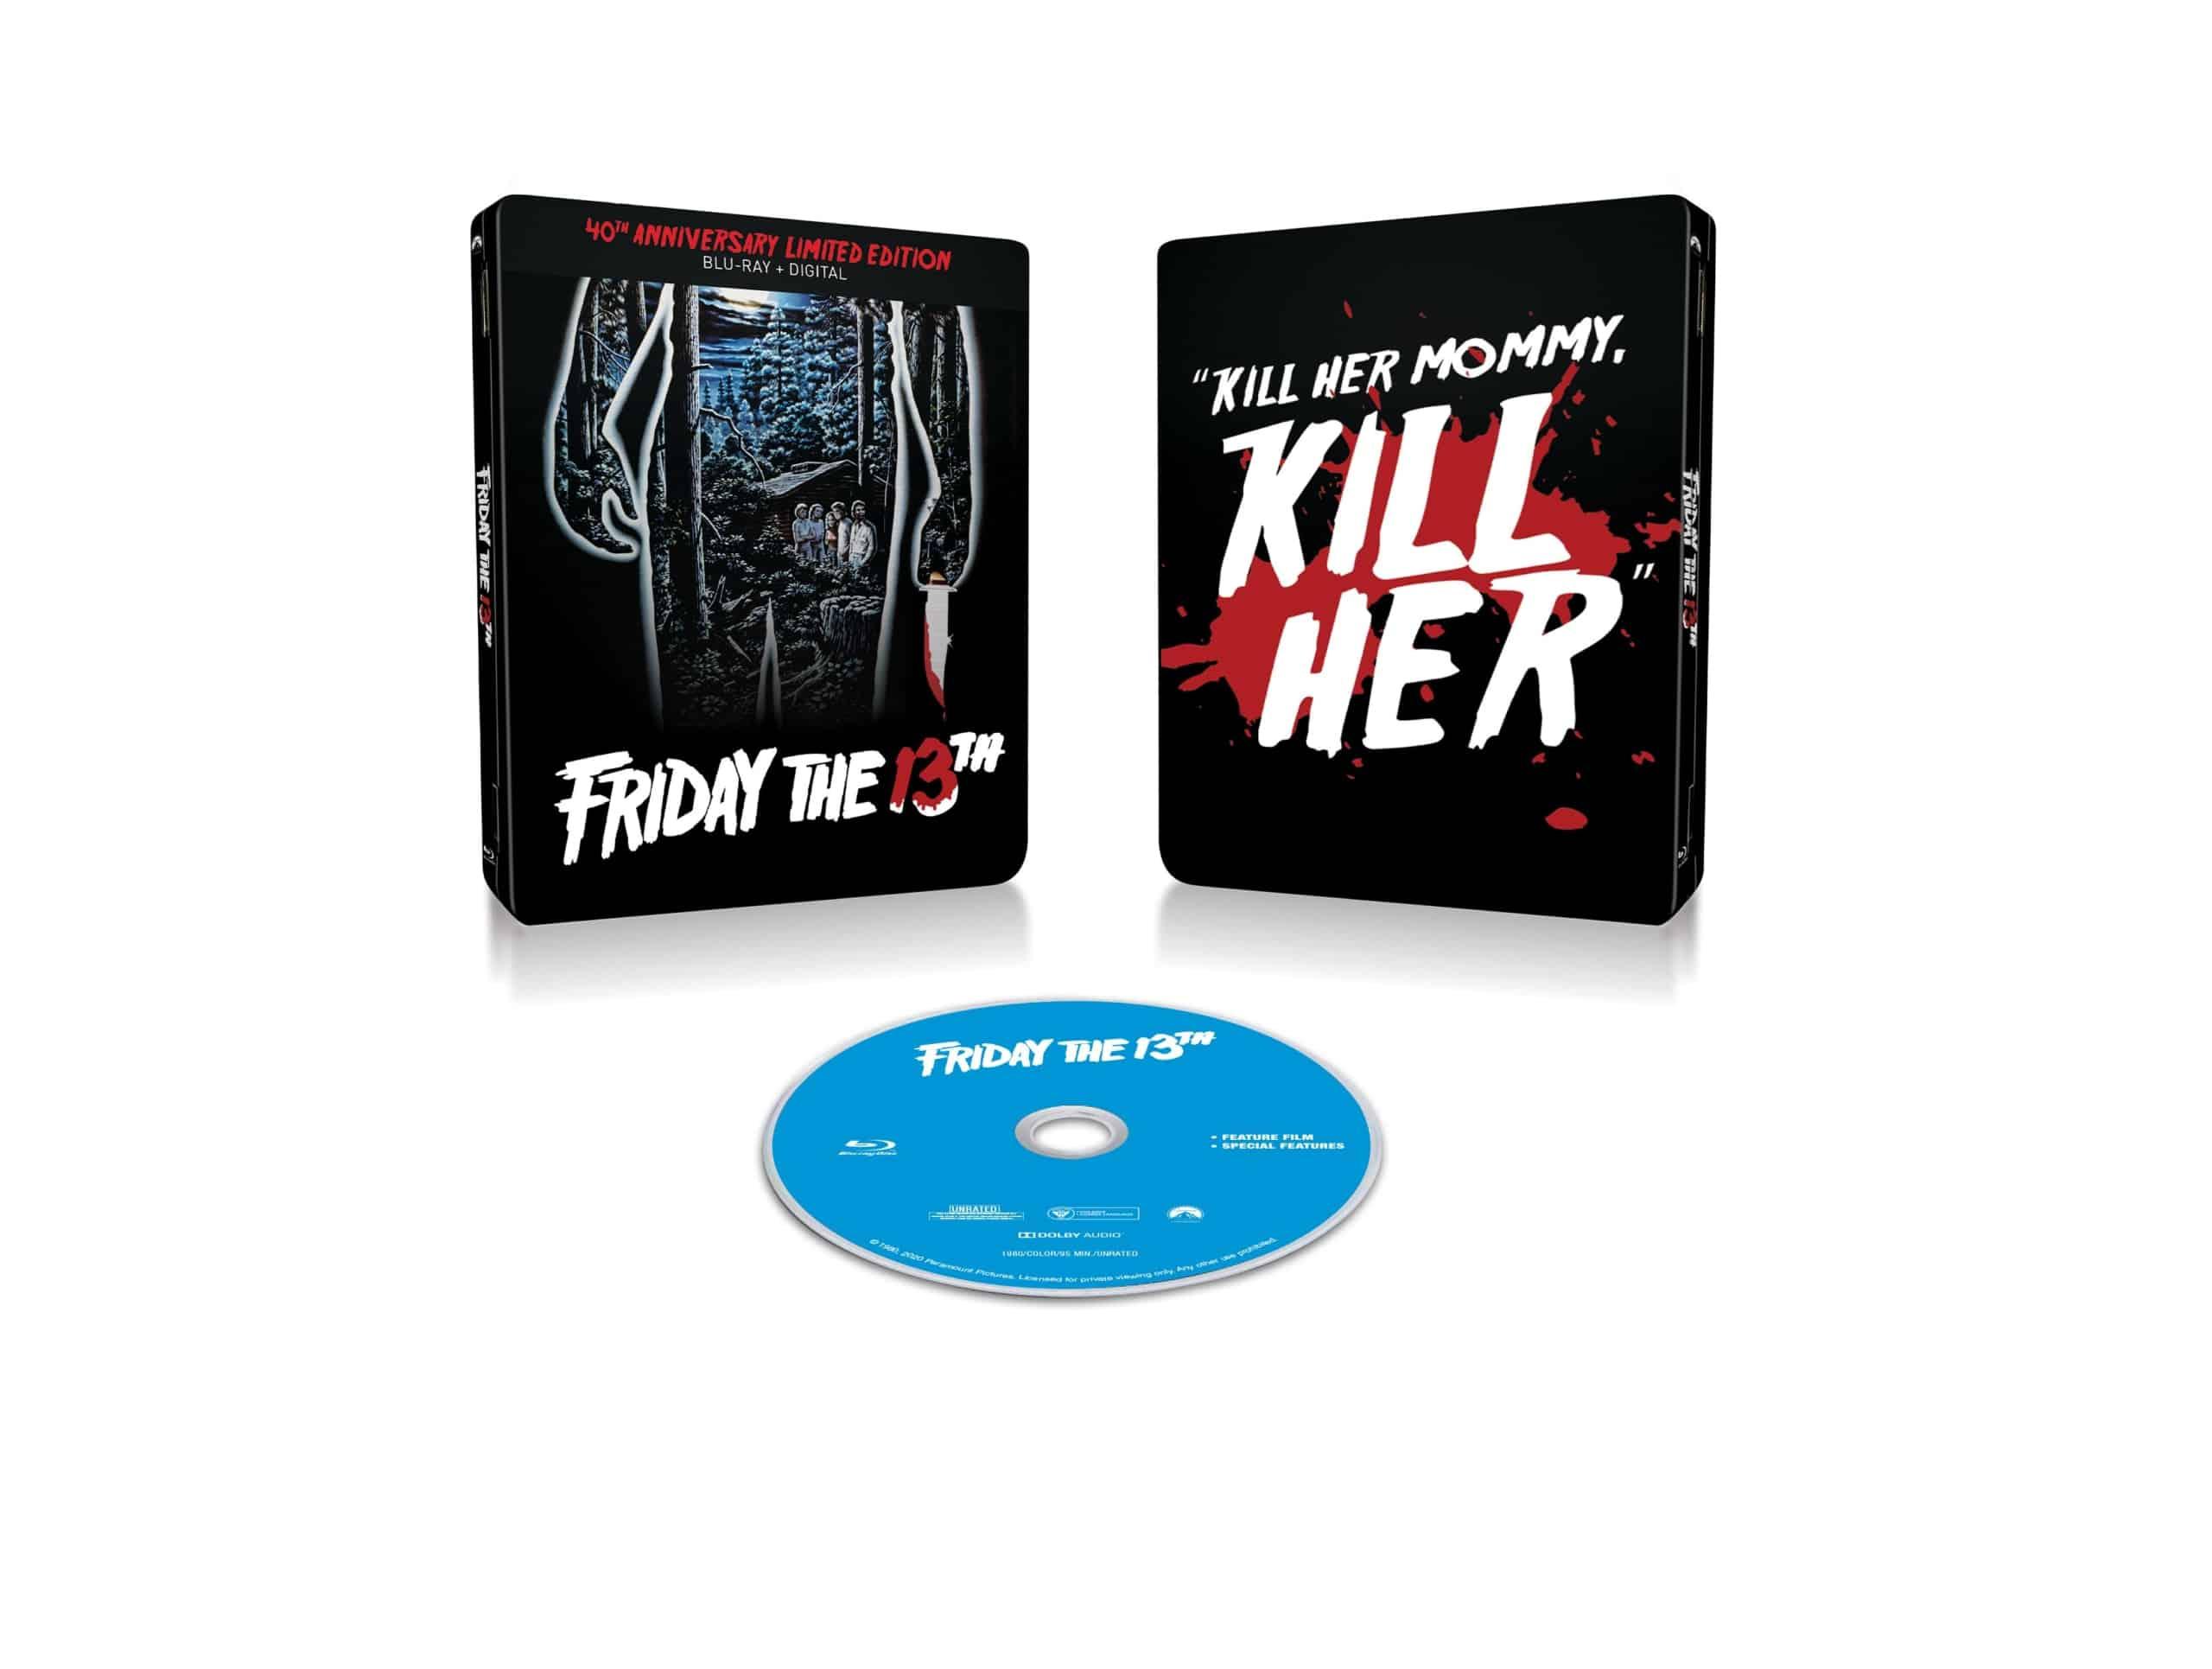 Friday the 13th Blu-ray box art 40th anniversary